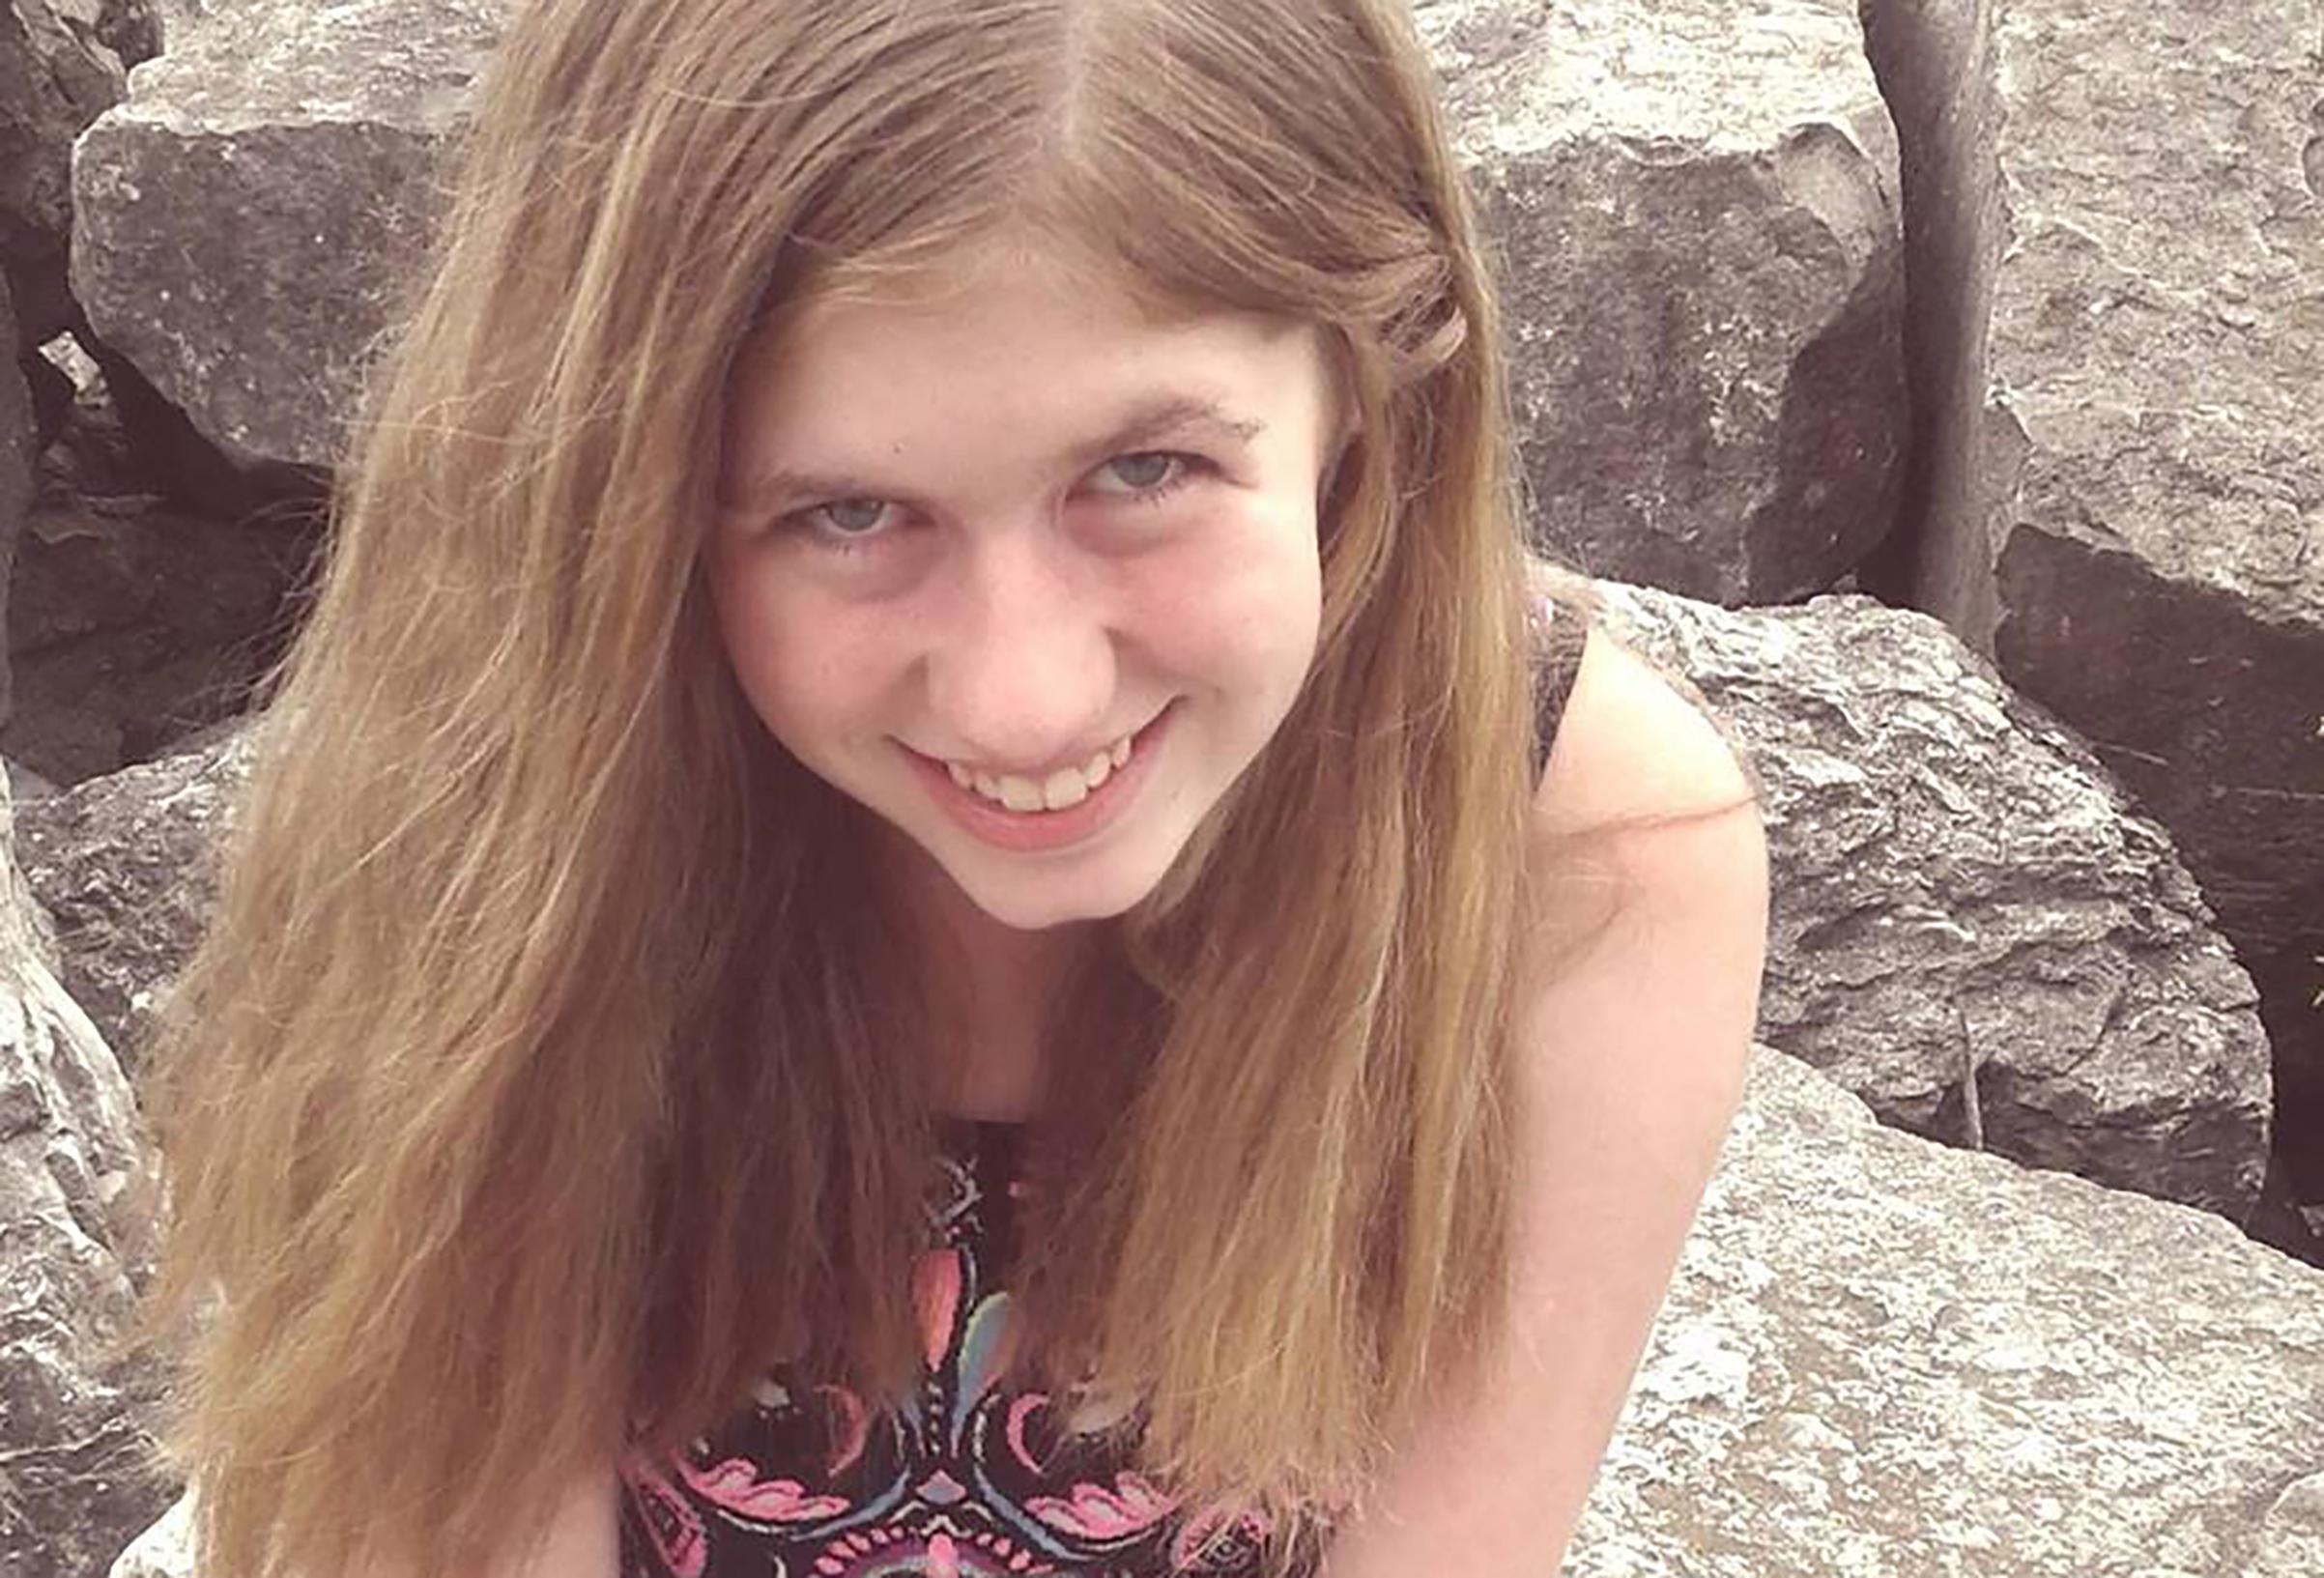 Jayme Closs went missing last October.